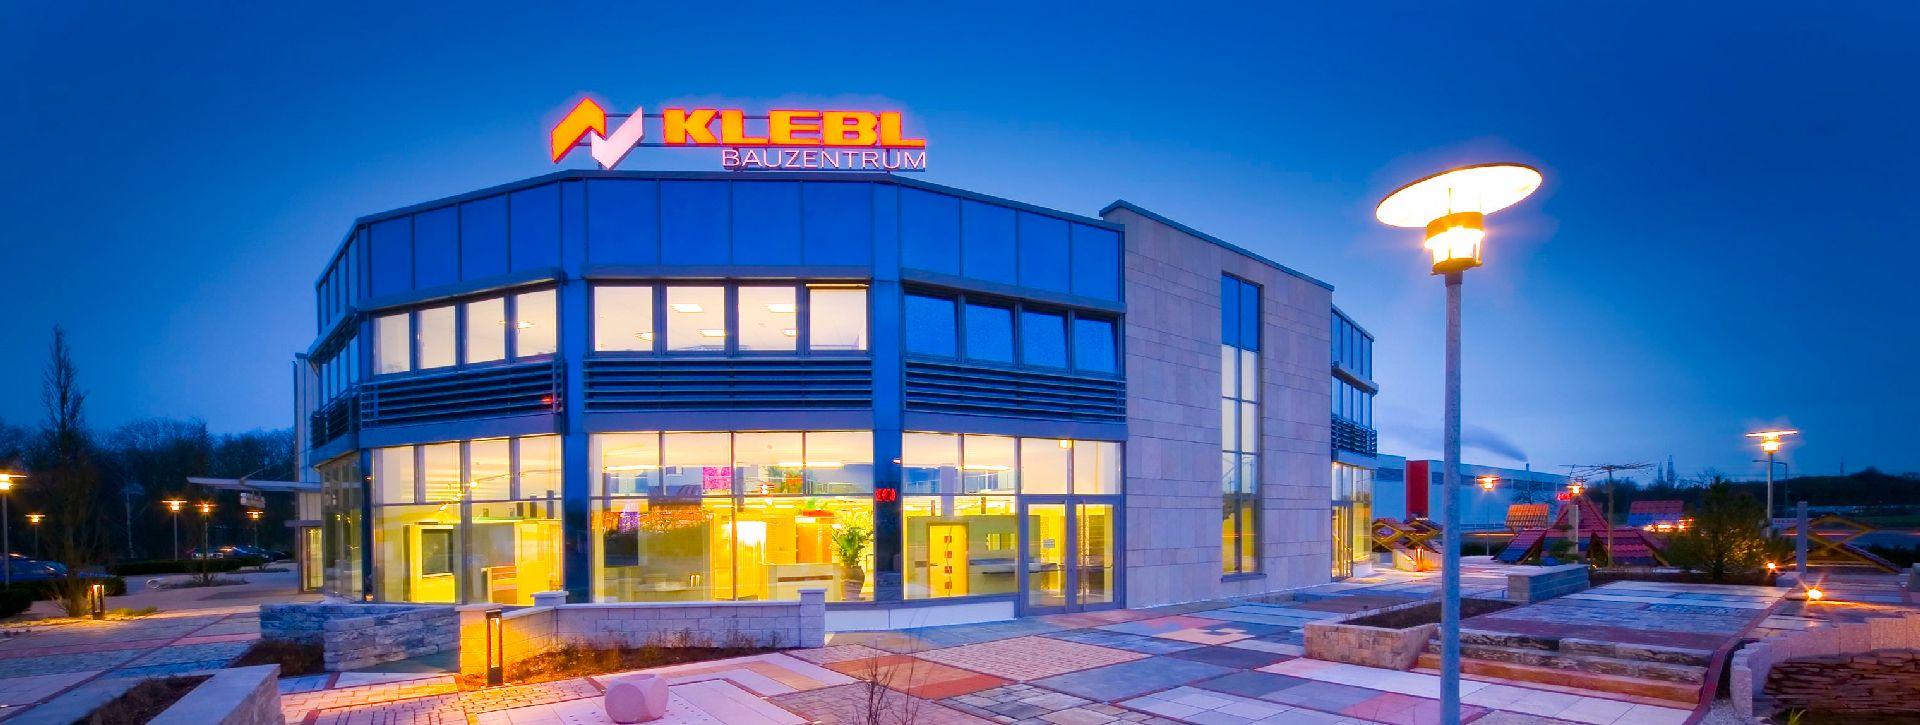 Standort Klebl Bauzentrum